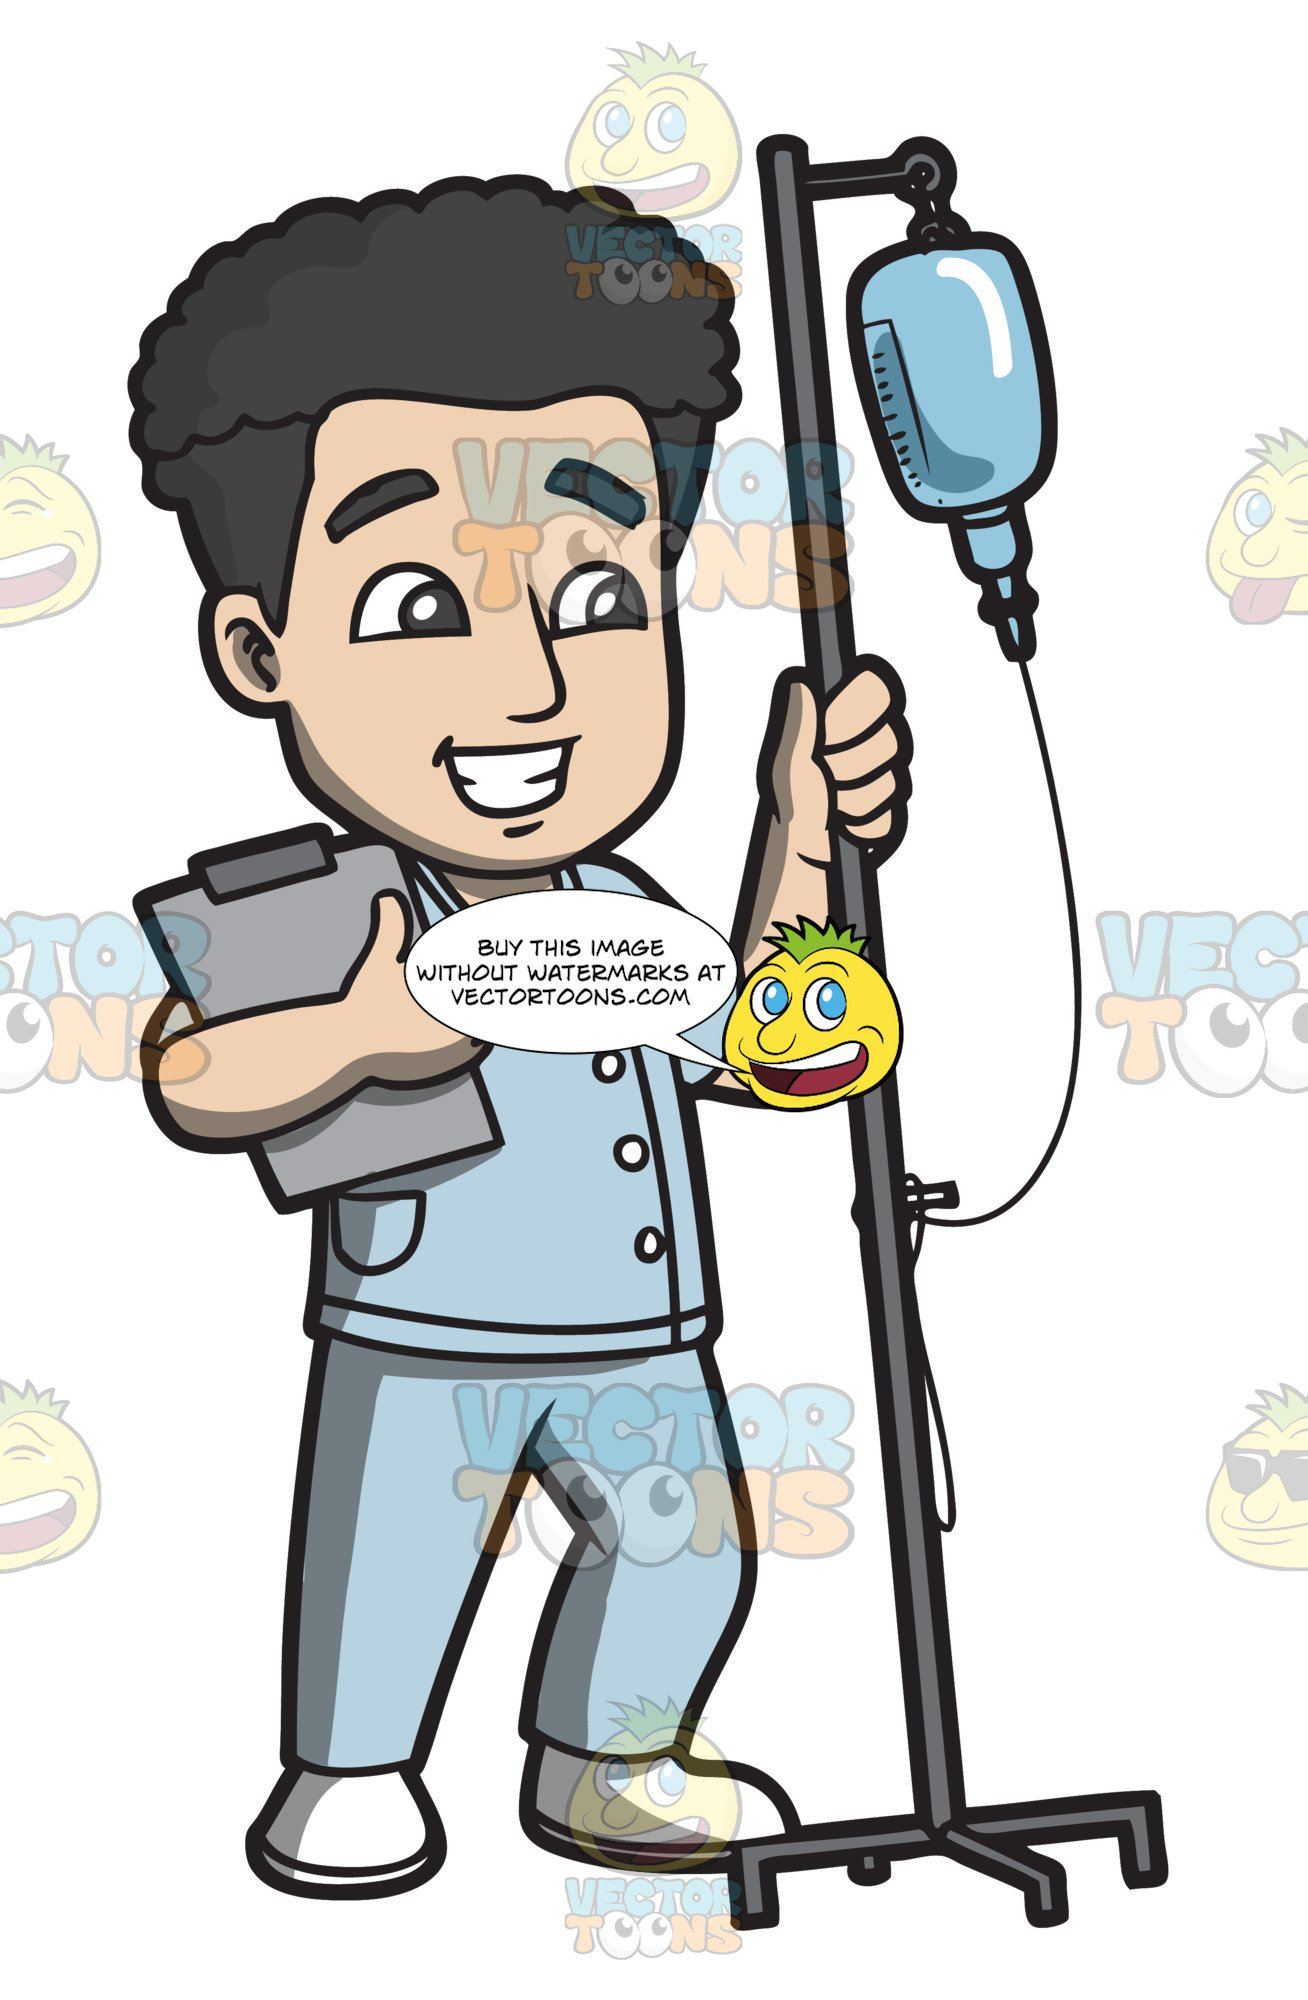 Male nurse pictures clipart clipart free A Male Nurse Carrying An Intravenous Fluid To A Patient clipart free